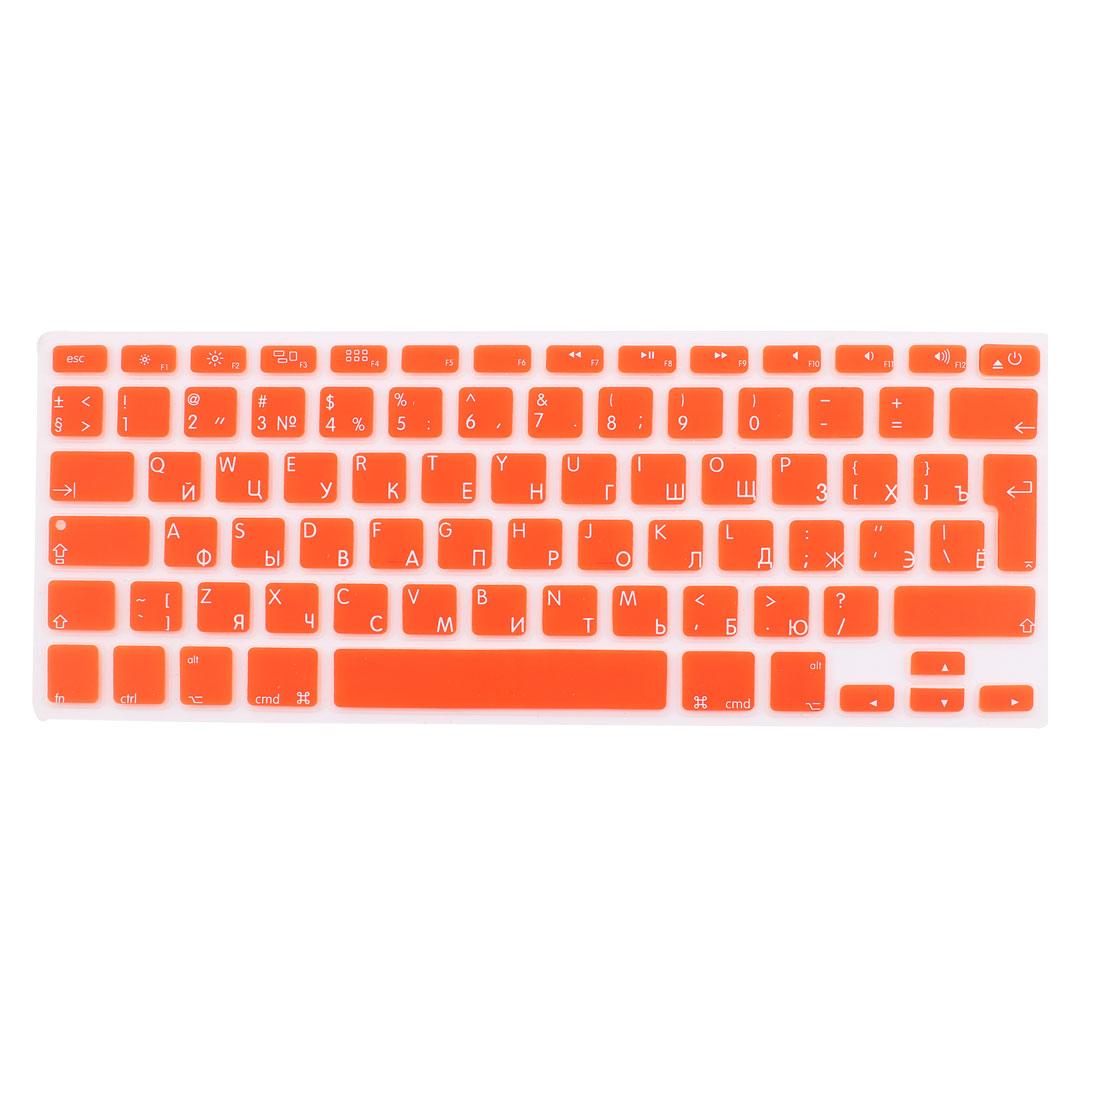 "Russian Silicone Keyboard Skin Cover Orange for Apple Macbook Air 13""15""17"" EU"